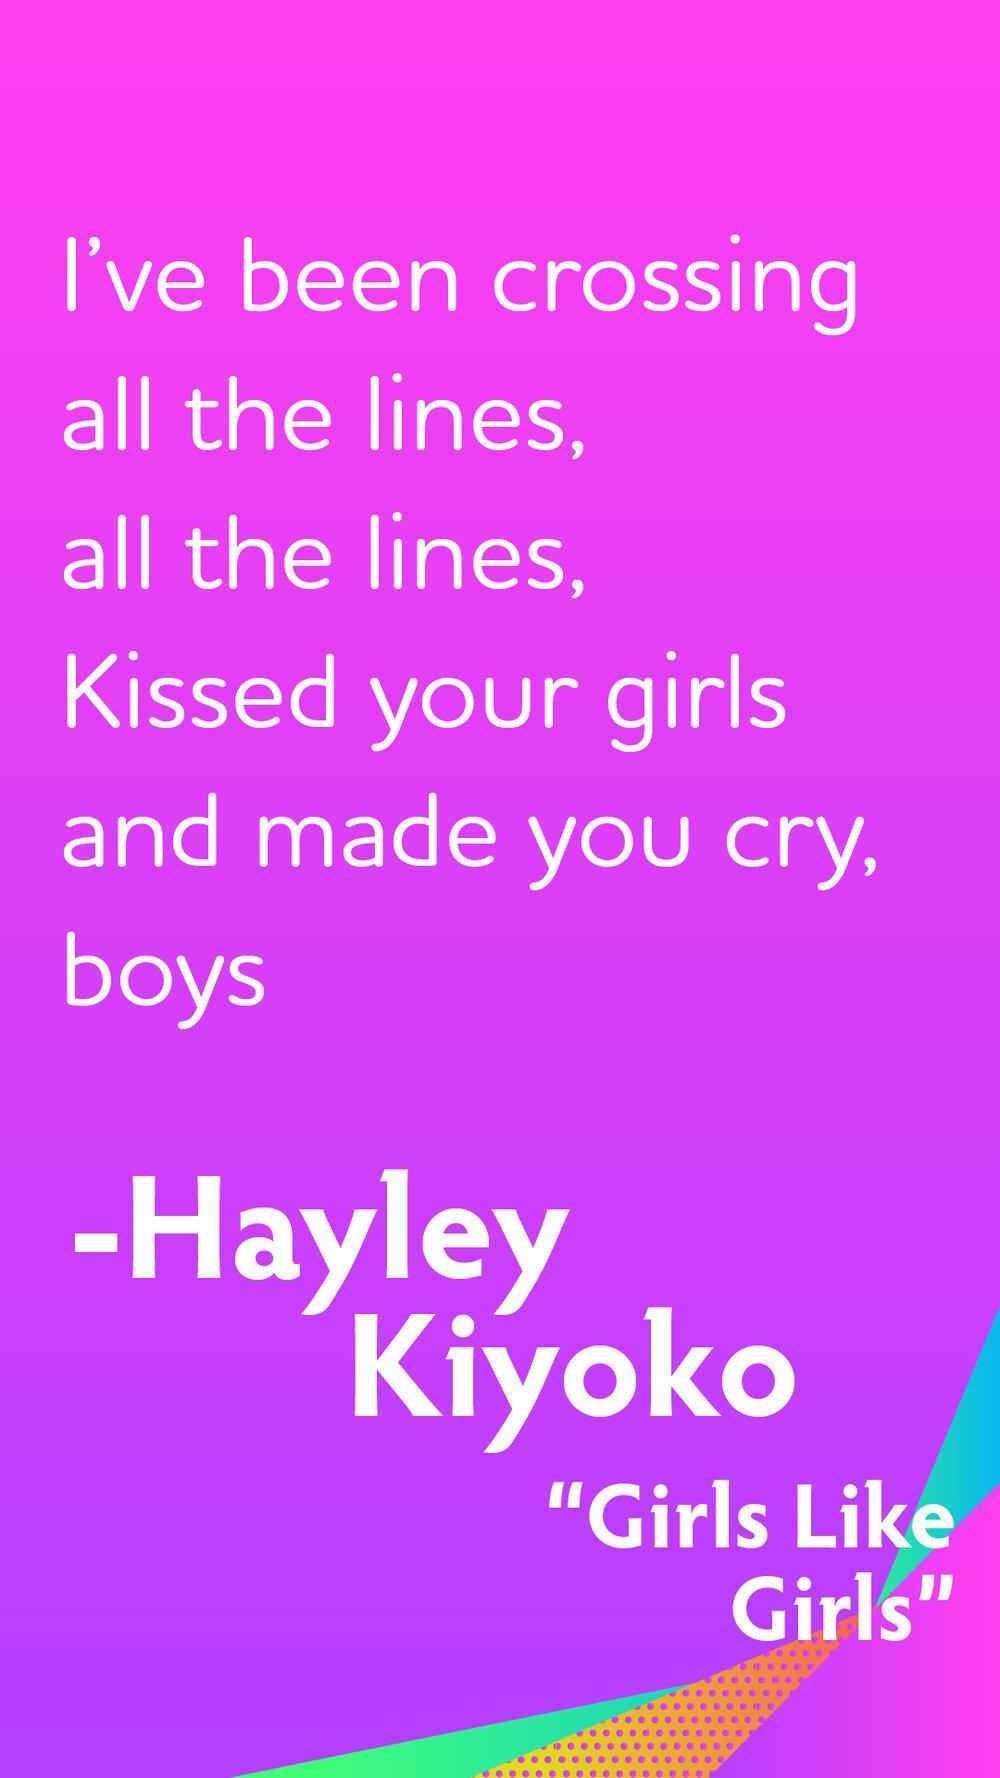 Pride2018_IGStory_Lyrics-05.jpg